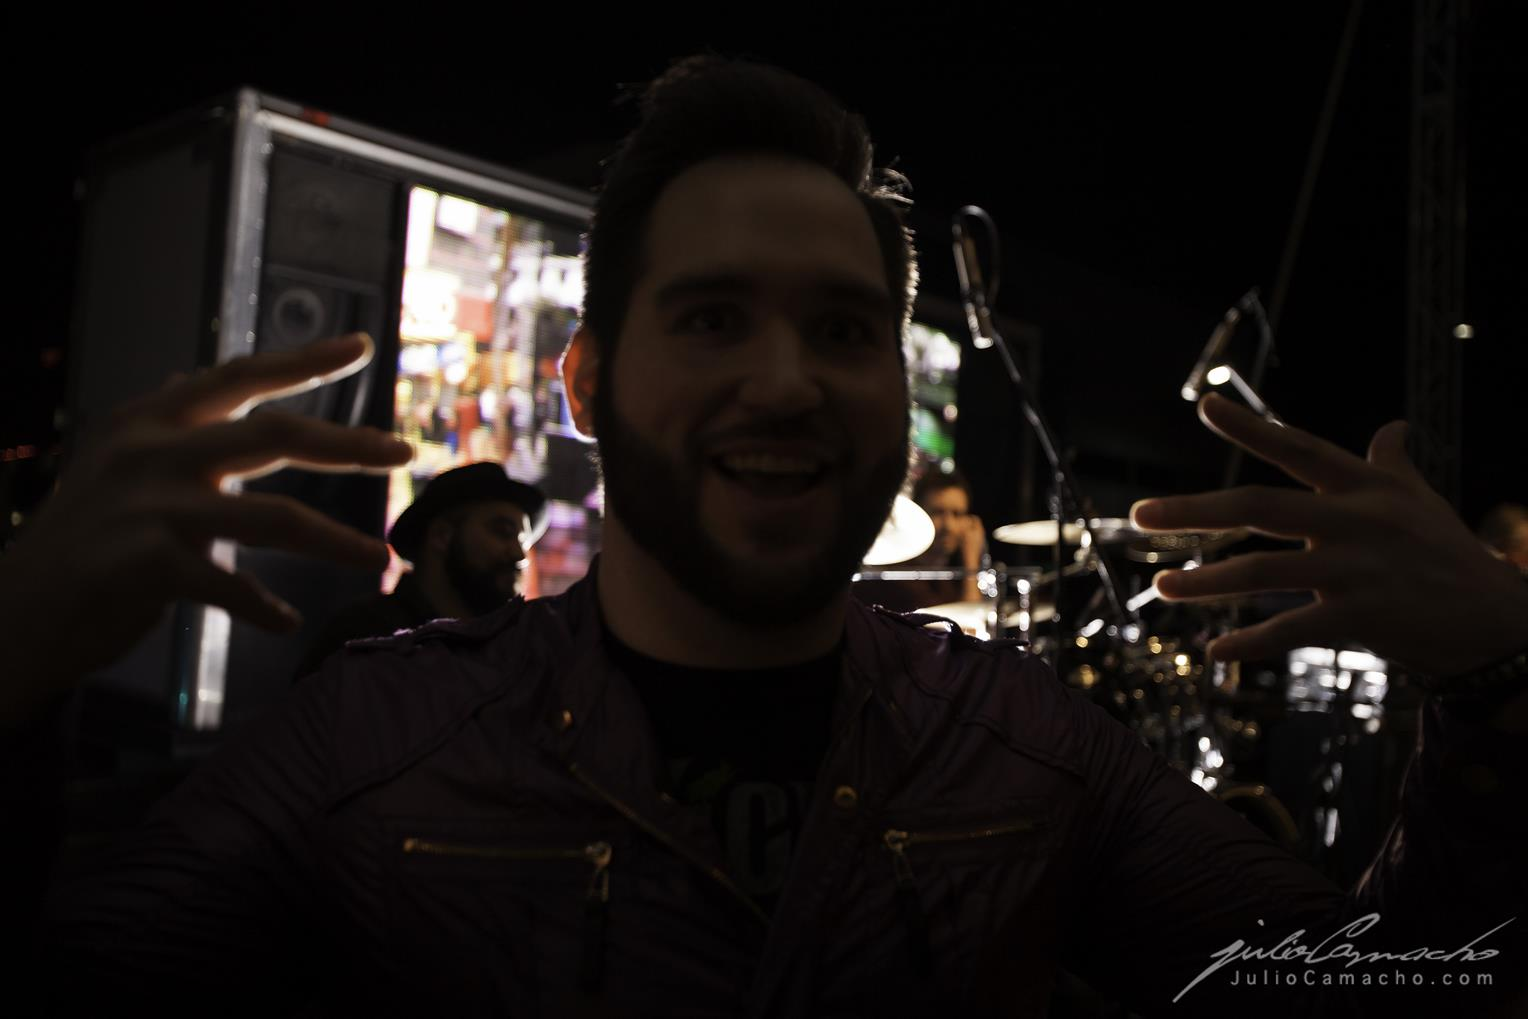 2014-10-30 31 CAST TOUR Ensenada y Tijuana - 1374 - www.Juli (Copy).jpg